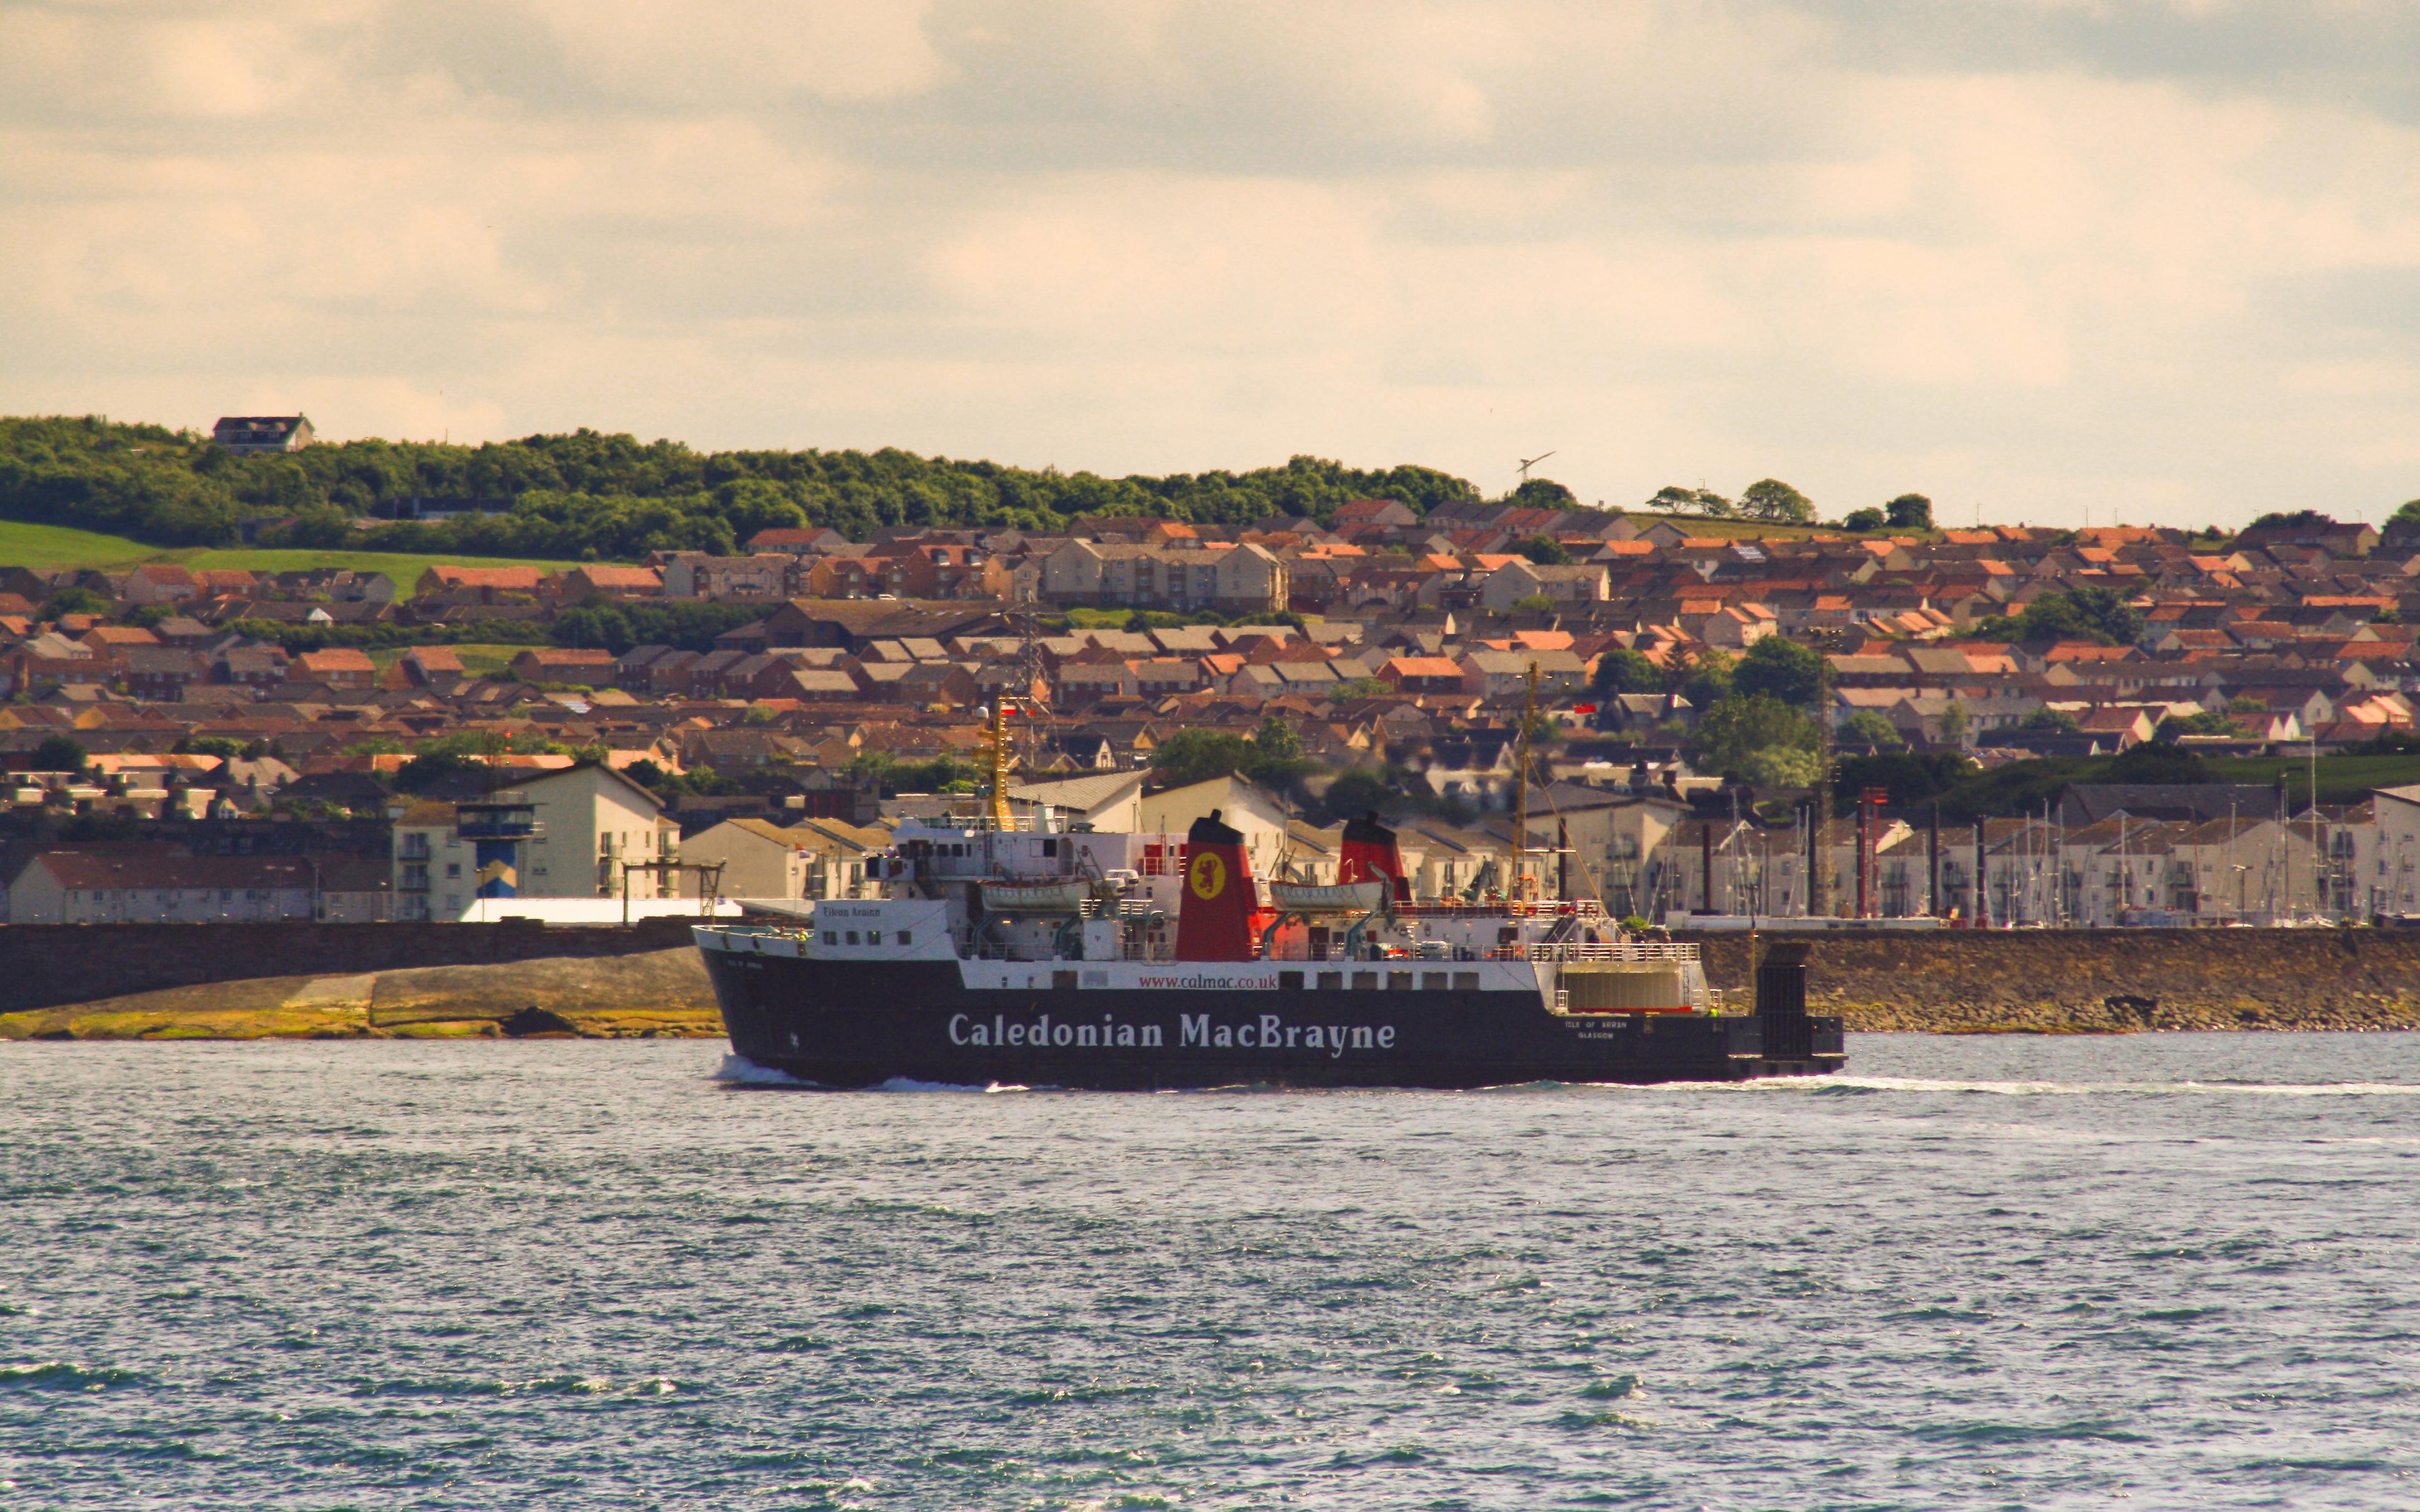 Isle of Arran approaching Ardrossan (Ships of CalMac)